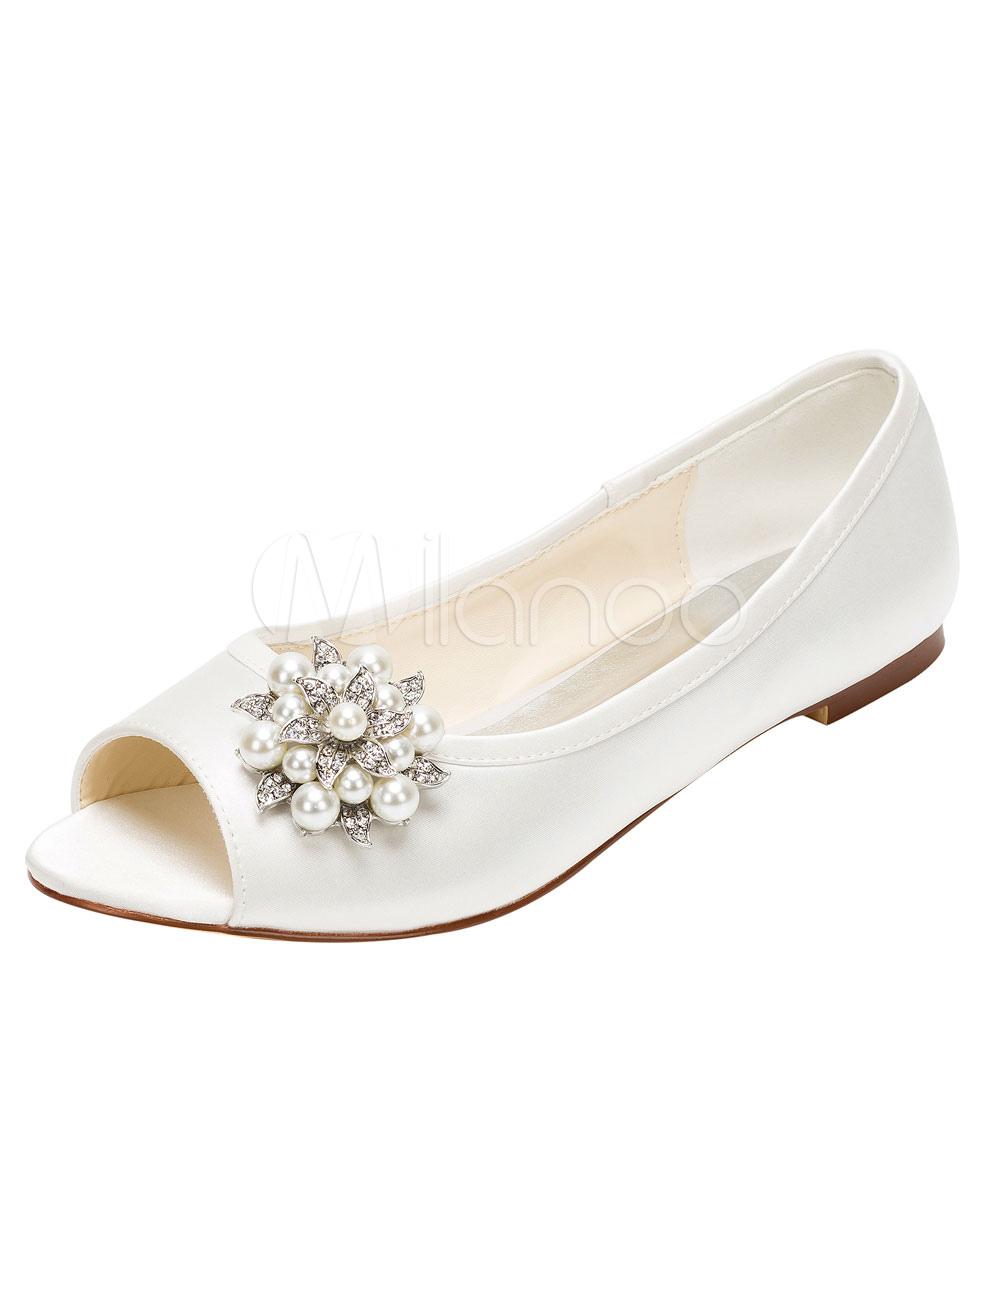 Peep Wedding Shoes Ivory Flat Pumps Pearl Rhinestone Slip-on Bridal Shoes